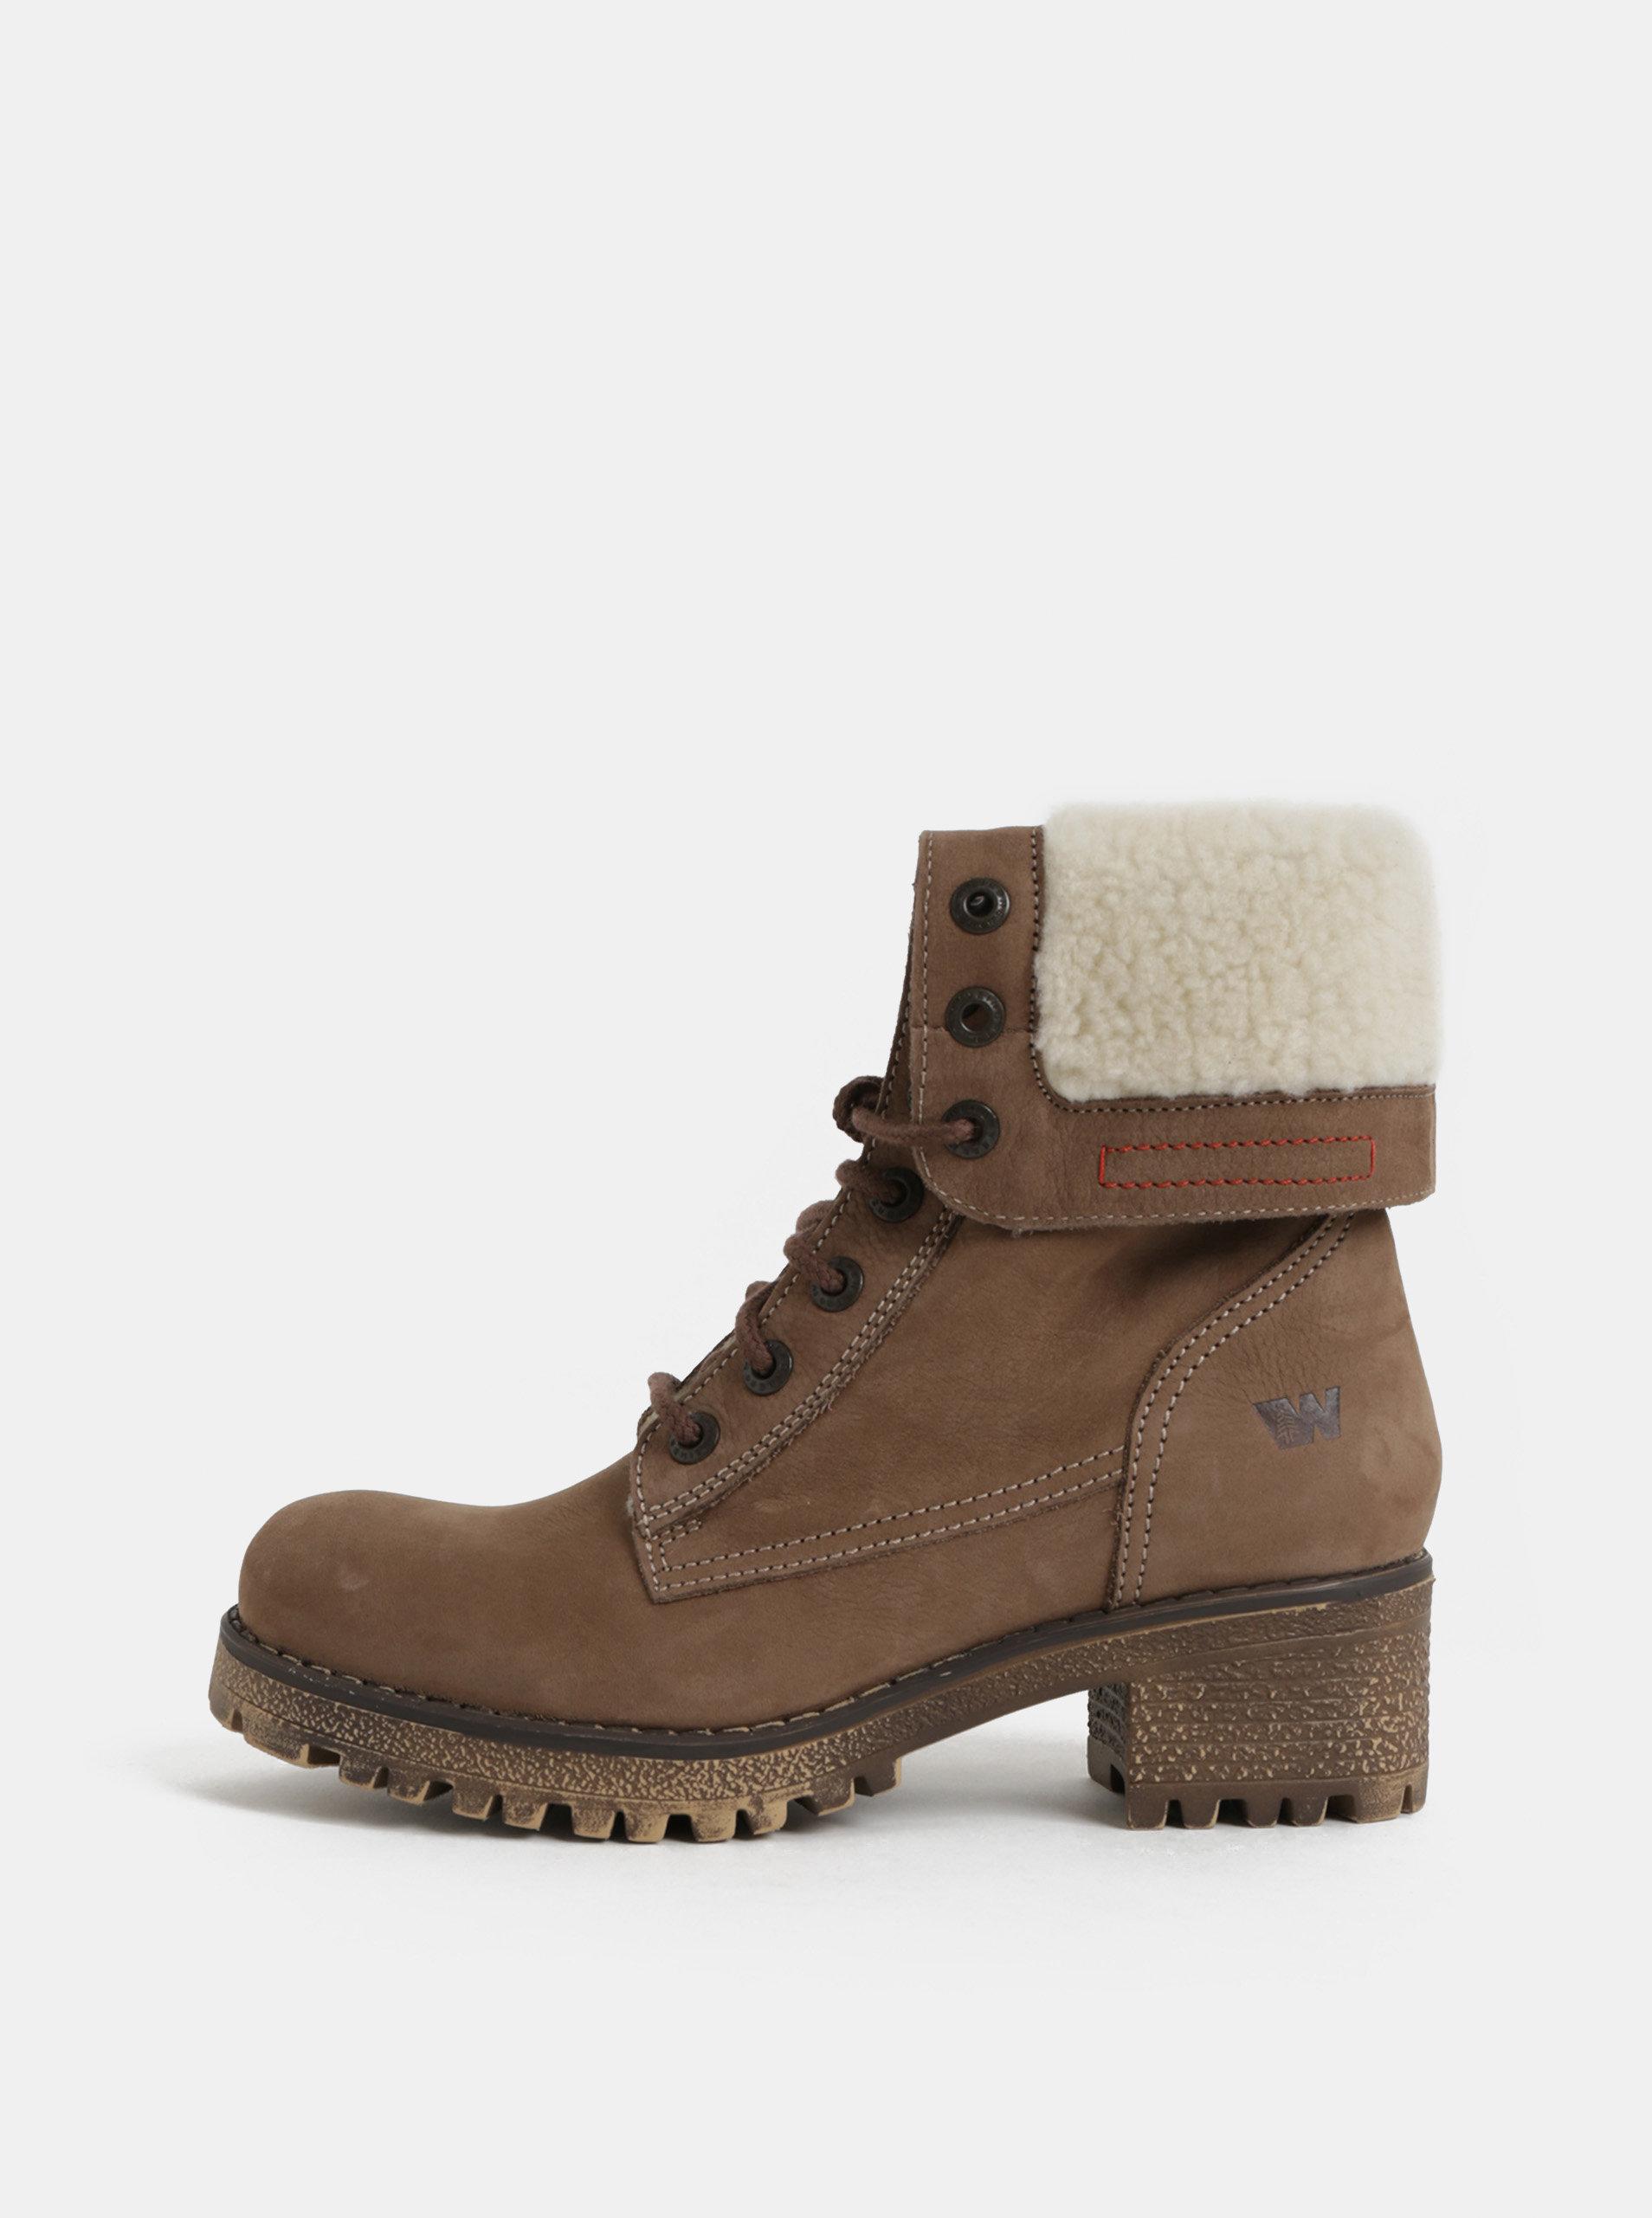 Hnedé dámske kožené členkové zimné topánky na podpätku Weinbrenner ... 575f5ae648c